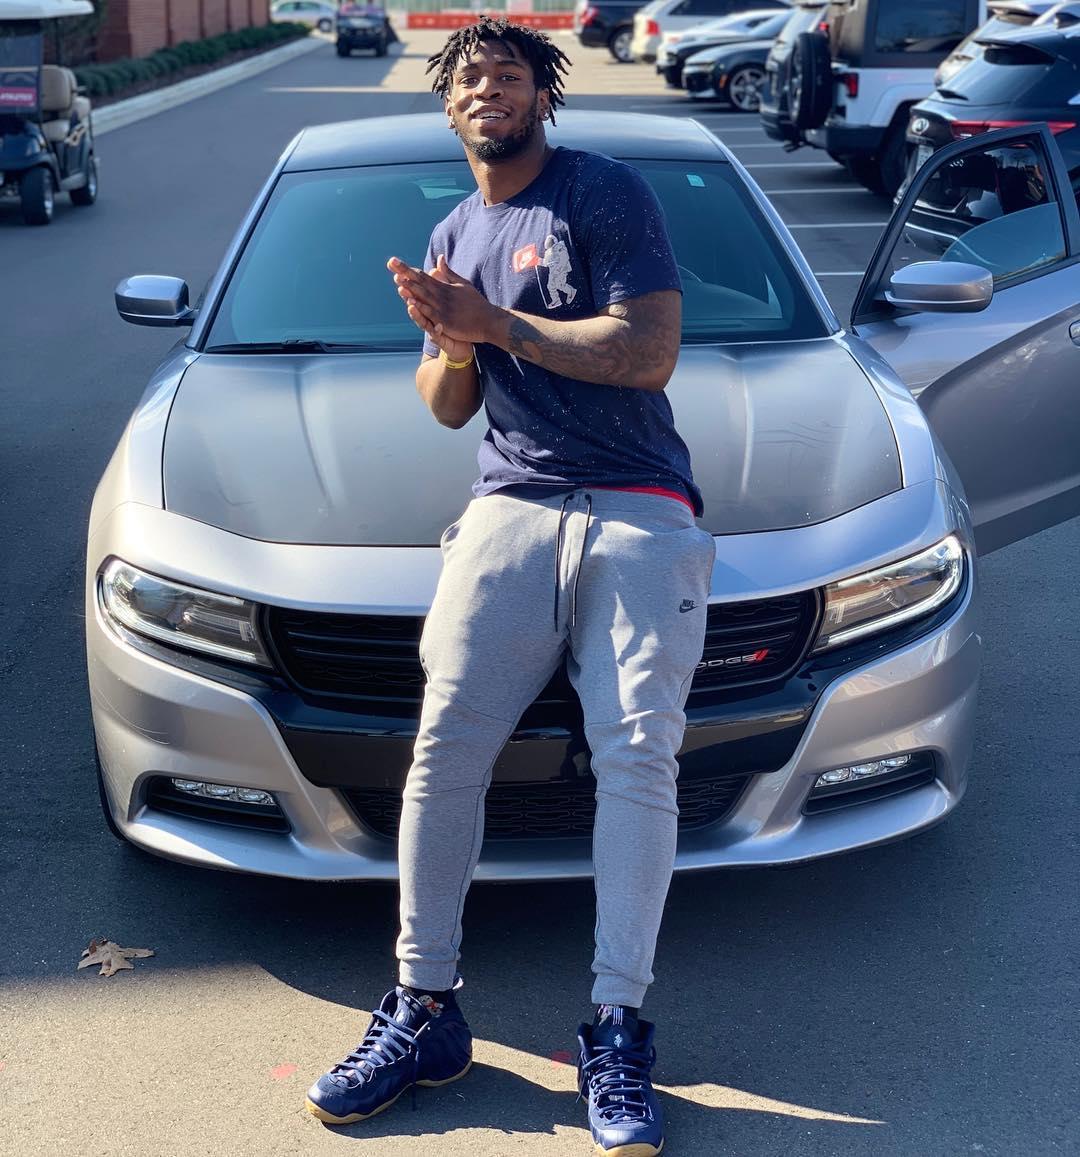 Eyabi on his car